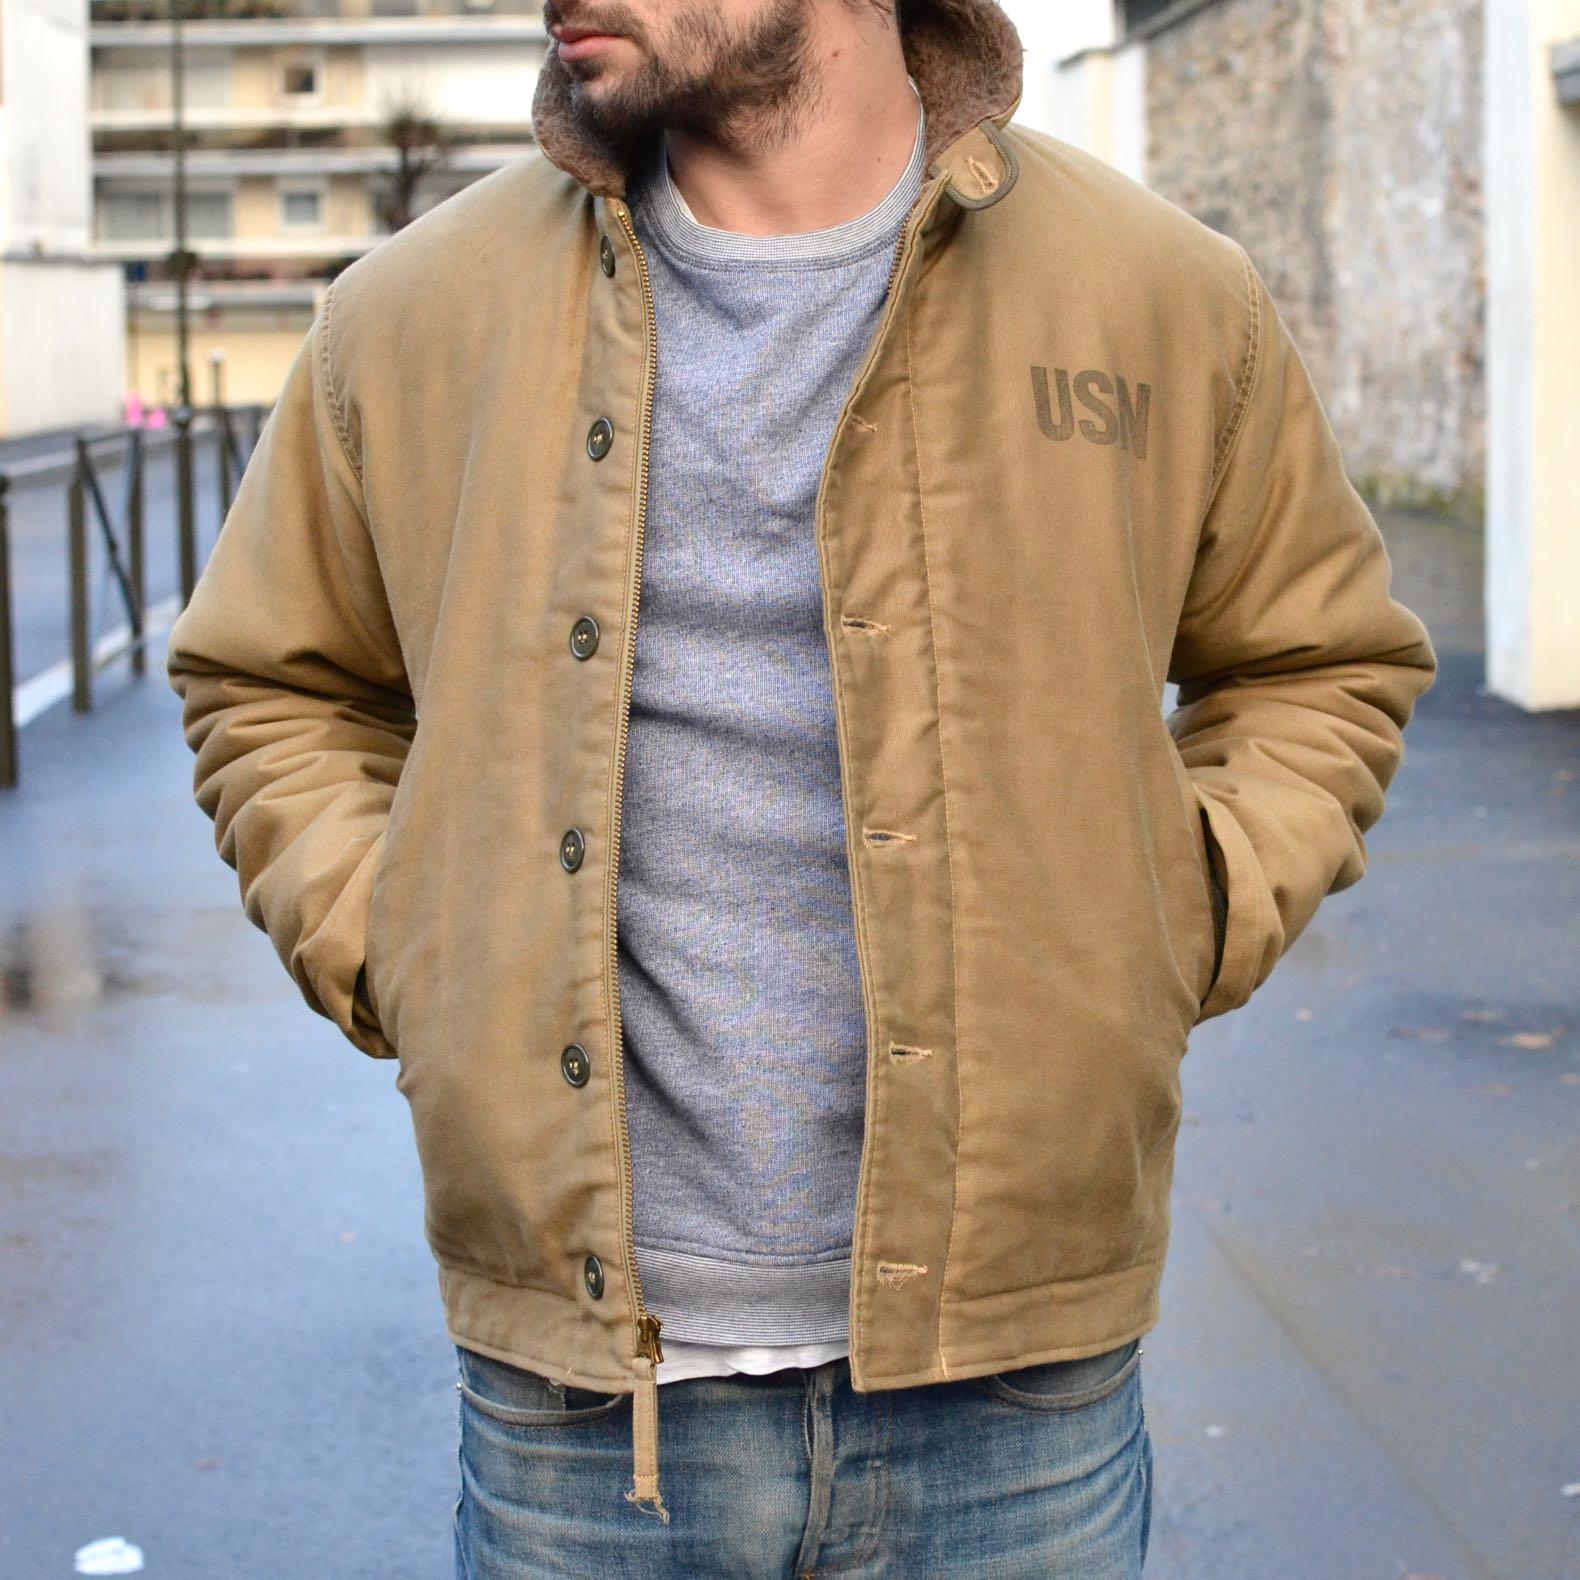 n1 deck jacket Buzz Rickson alpaga liner